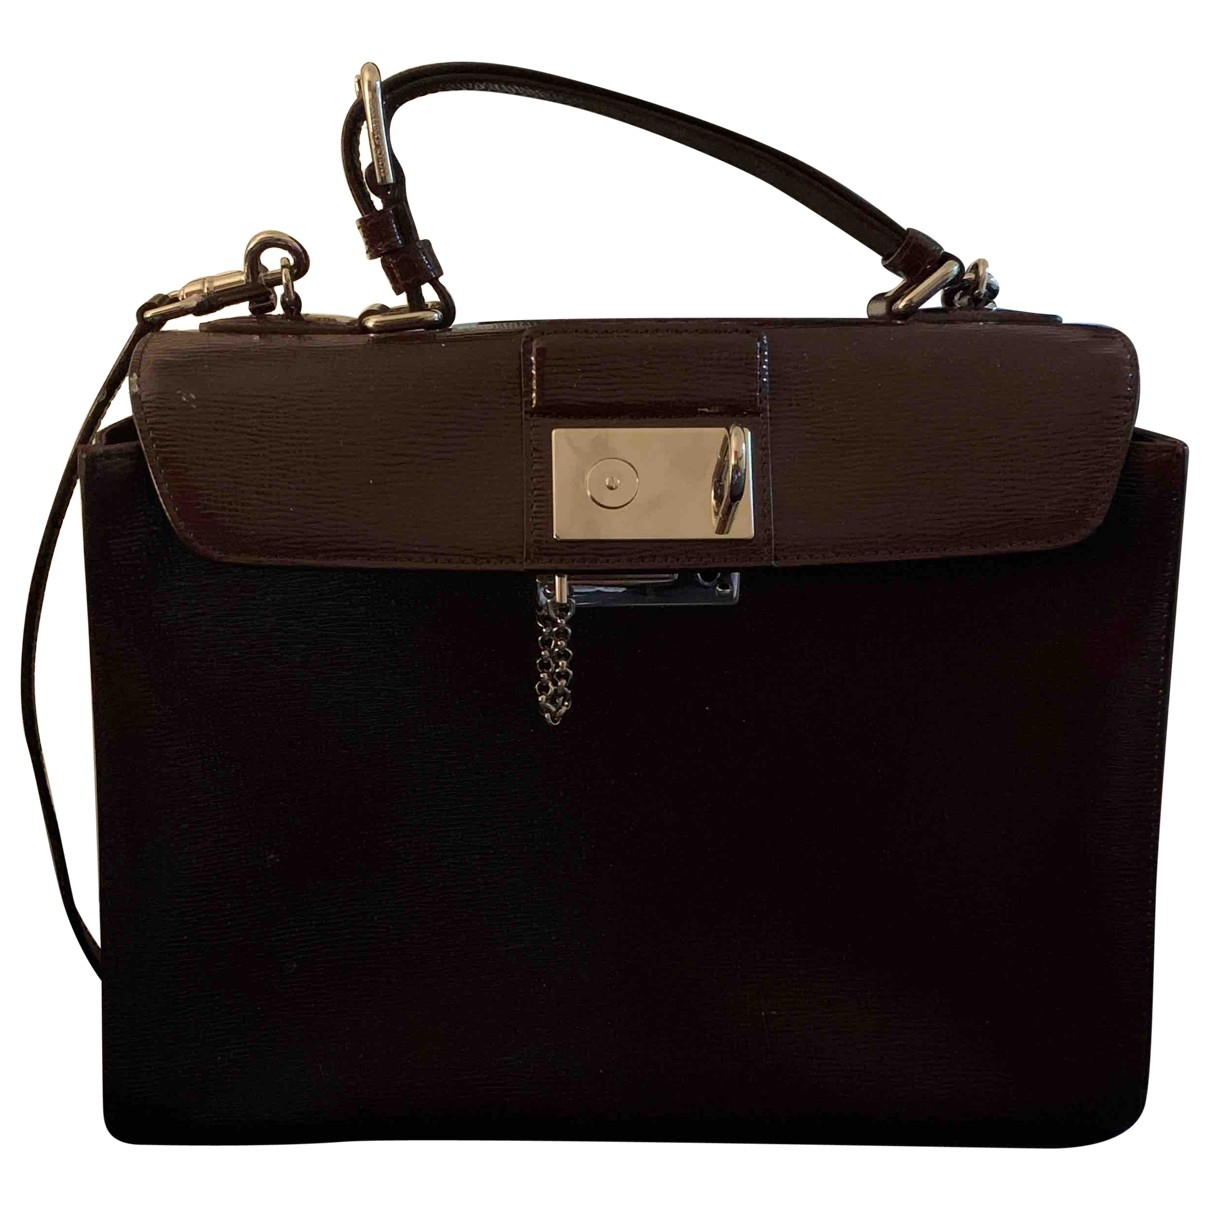 Dolce & Gabbana \N Handtasche in  Lila Leder